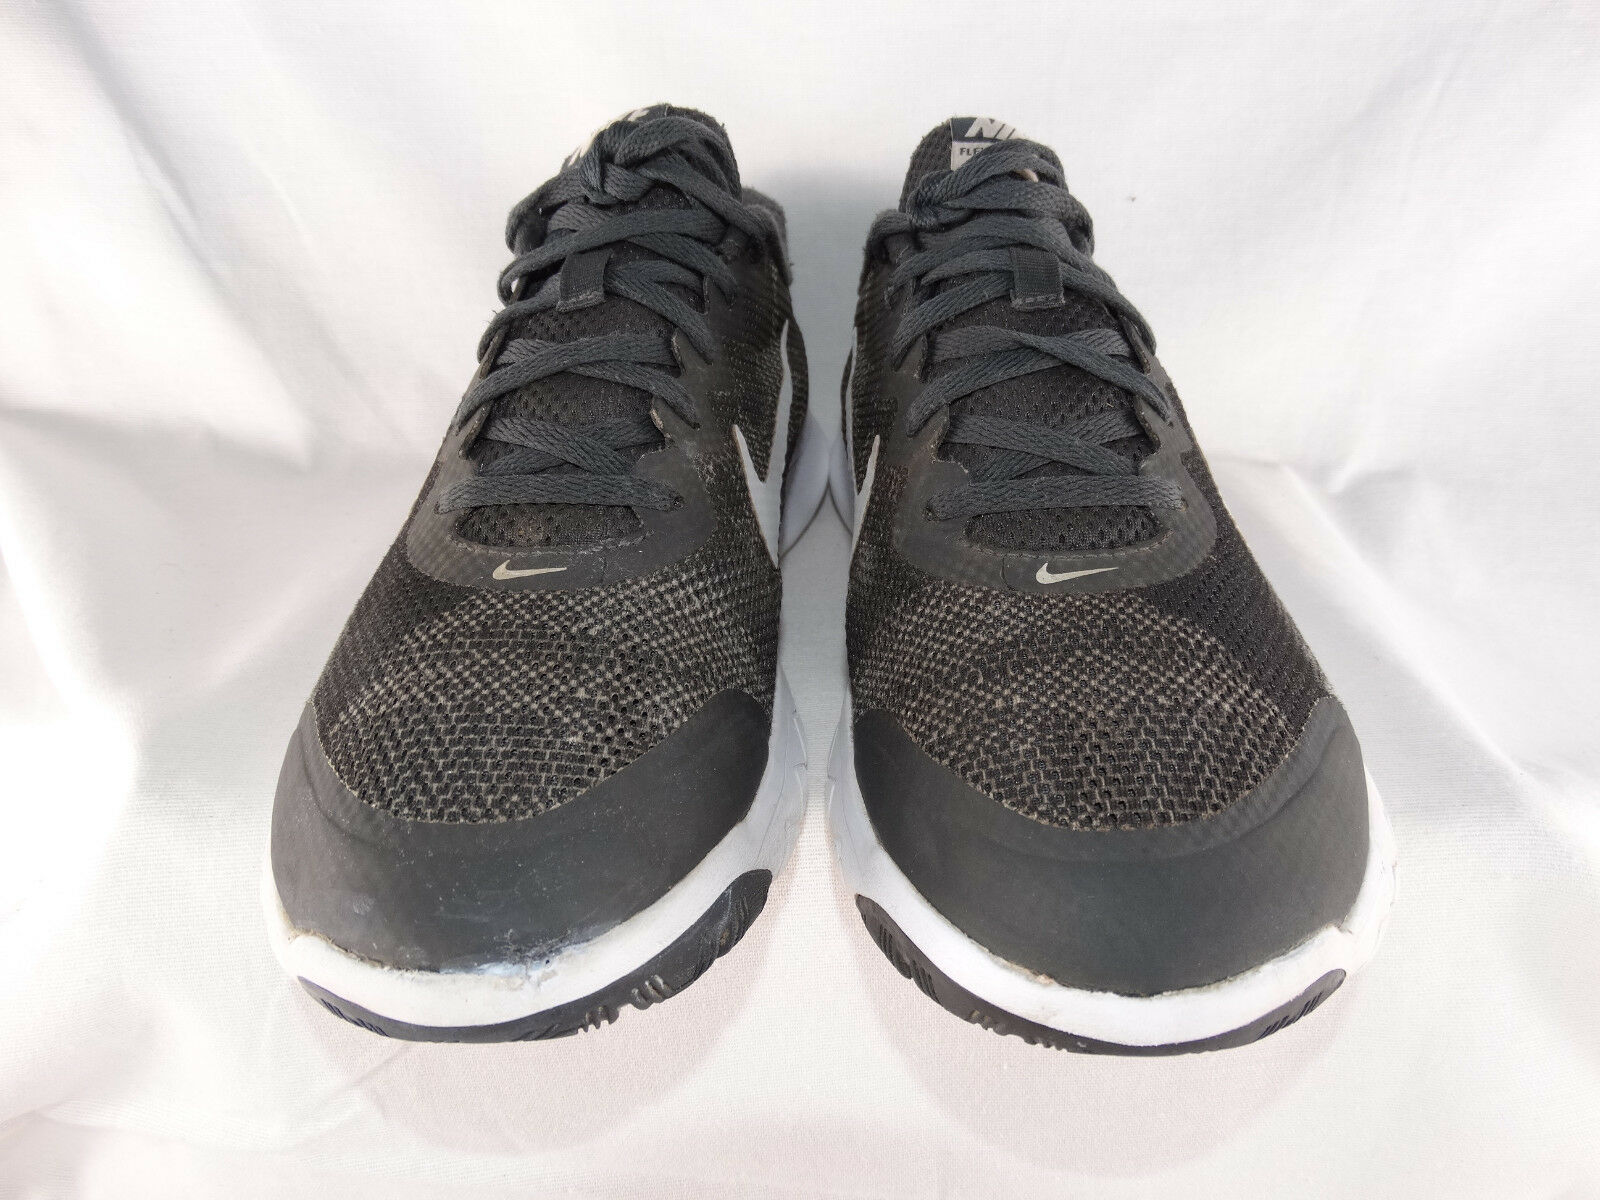 Nike Flex Experience Run 4 Premium Laufschuhe 749174-011 grau-weiß grau-weiß grau-weiß EU 44 US 10 b2e5e1